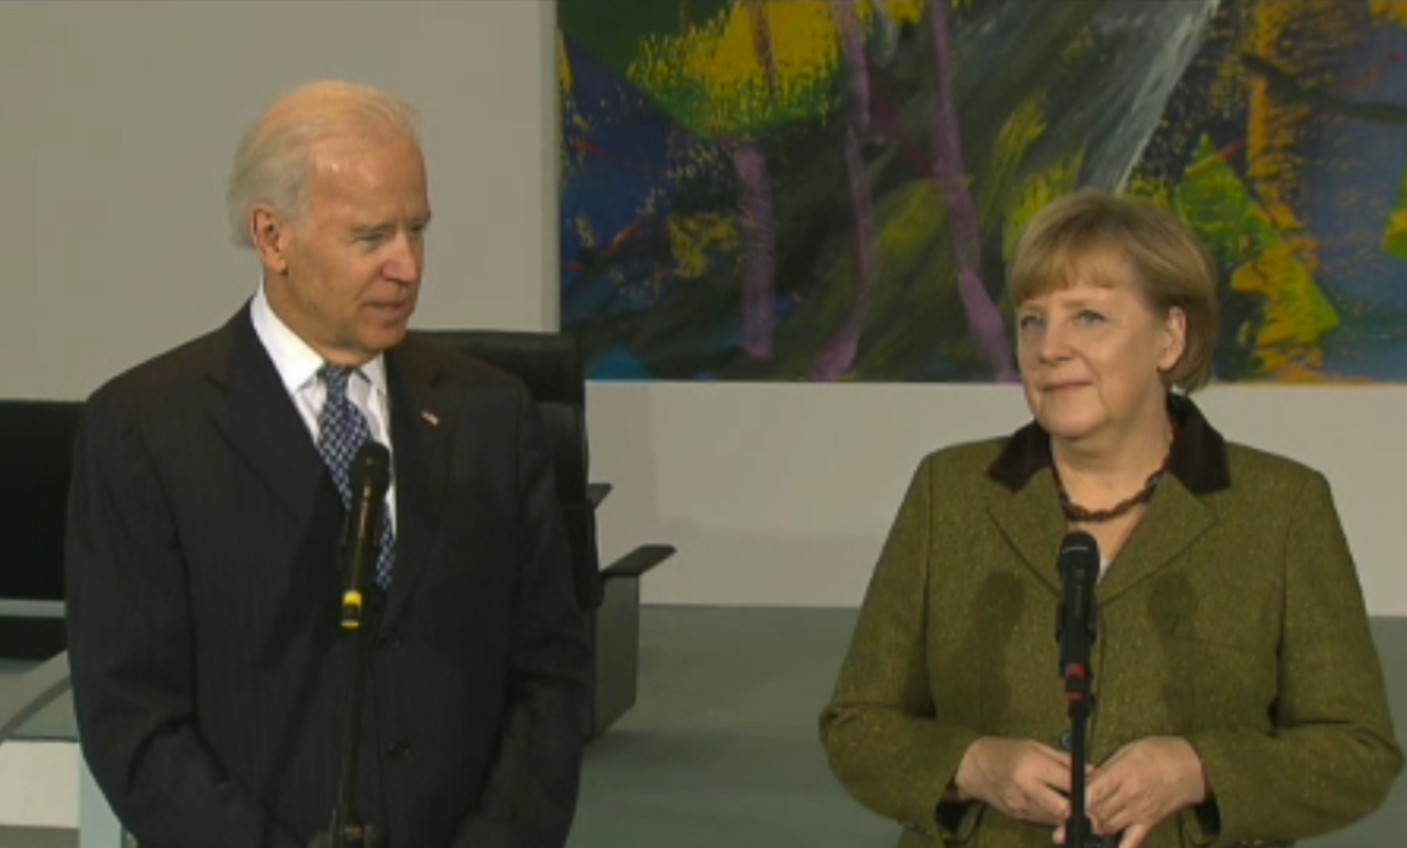 Joe Biden dials German Chancellor Merkel, seeks to revitalise transatlantic alliance